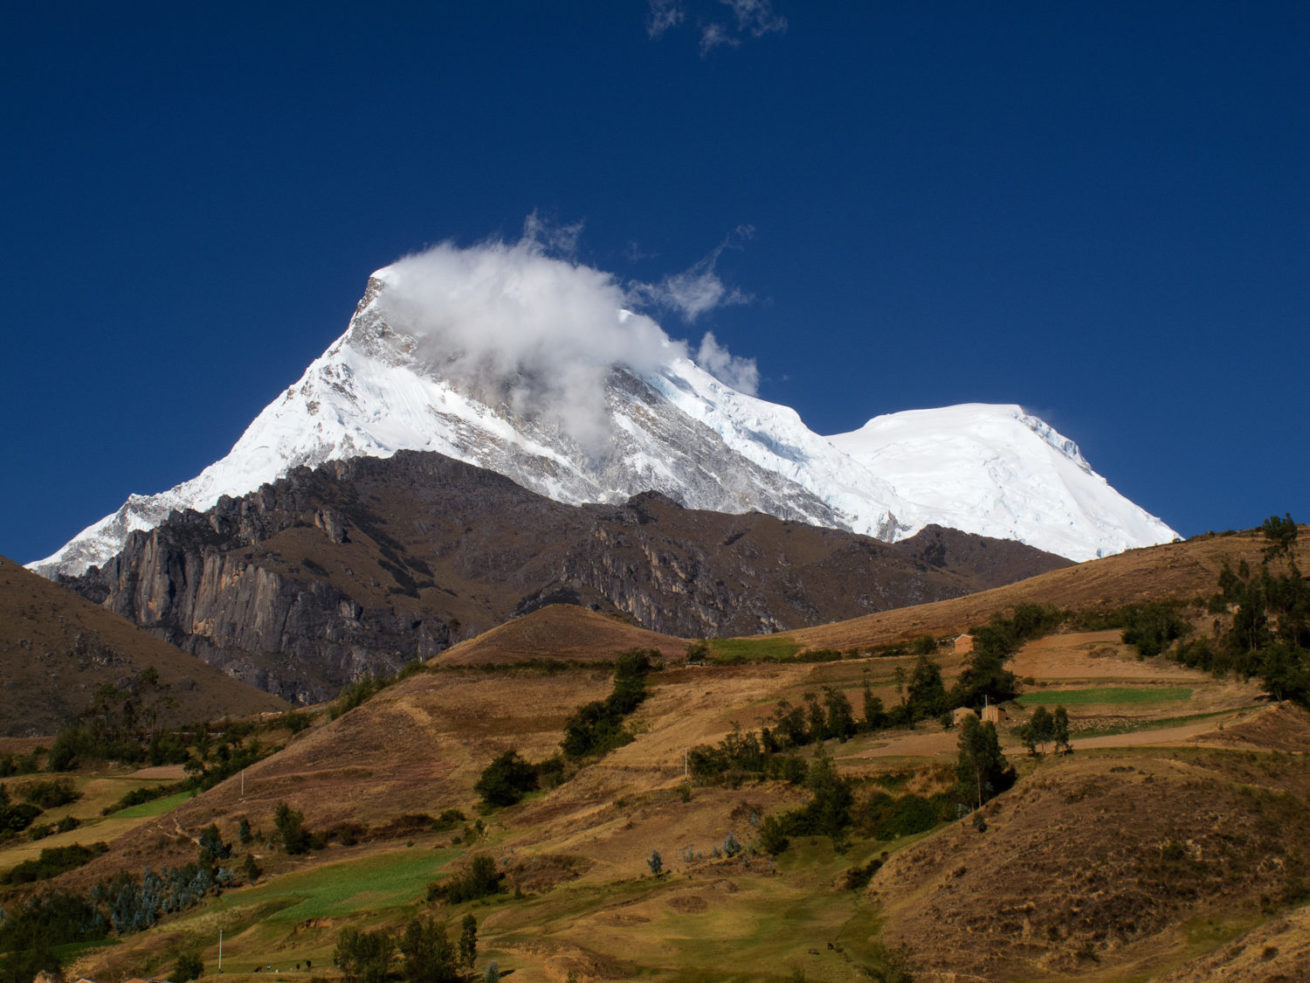 Climbing Tour to Cordillera Blanca in Peru to climb Huascaran peak